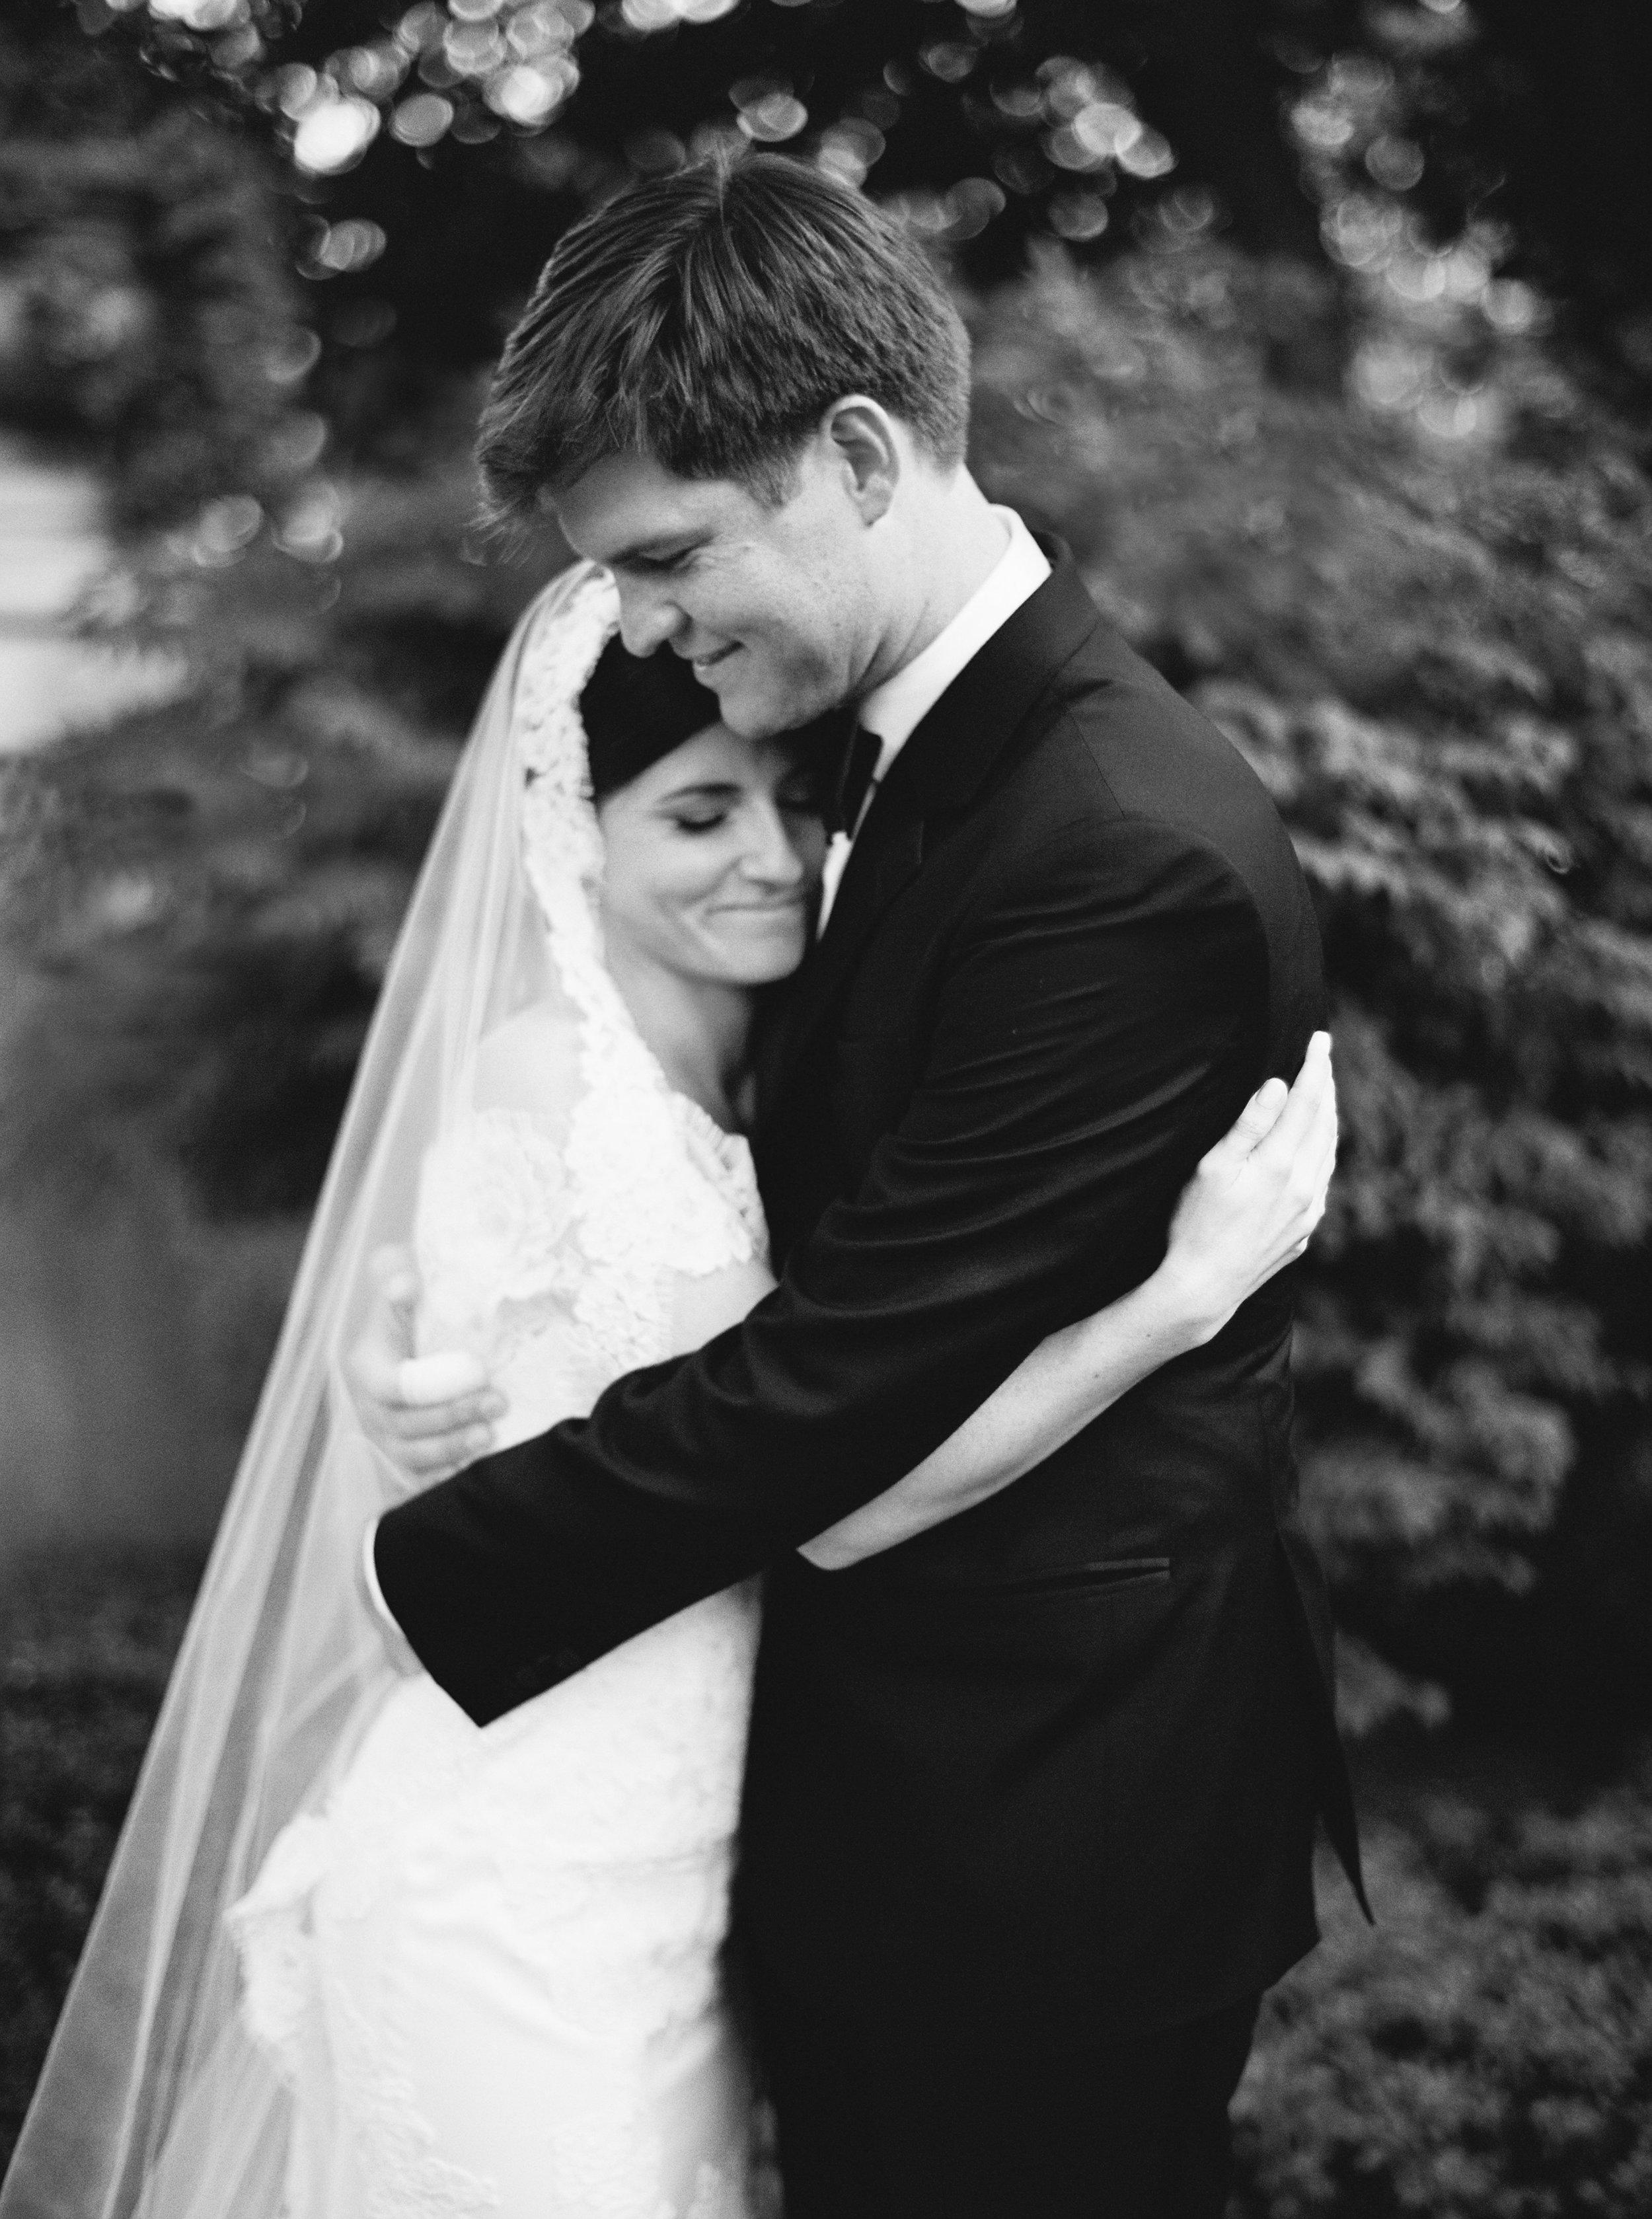 Kyle John l Fine Art Wedding Photography l Chicago, Copenhagen, California, New York, Destination l Blog l Connie & Connor_Winnetka_23